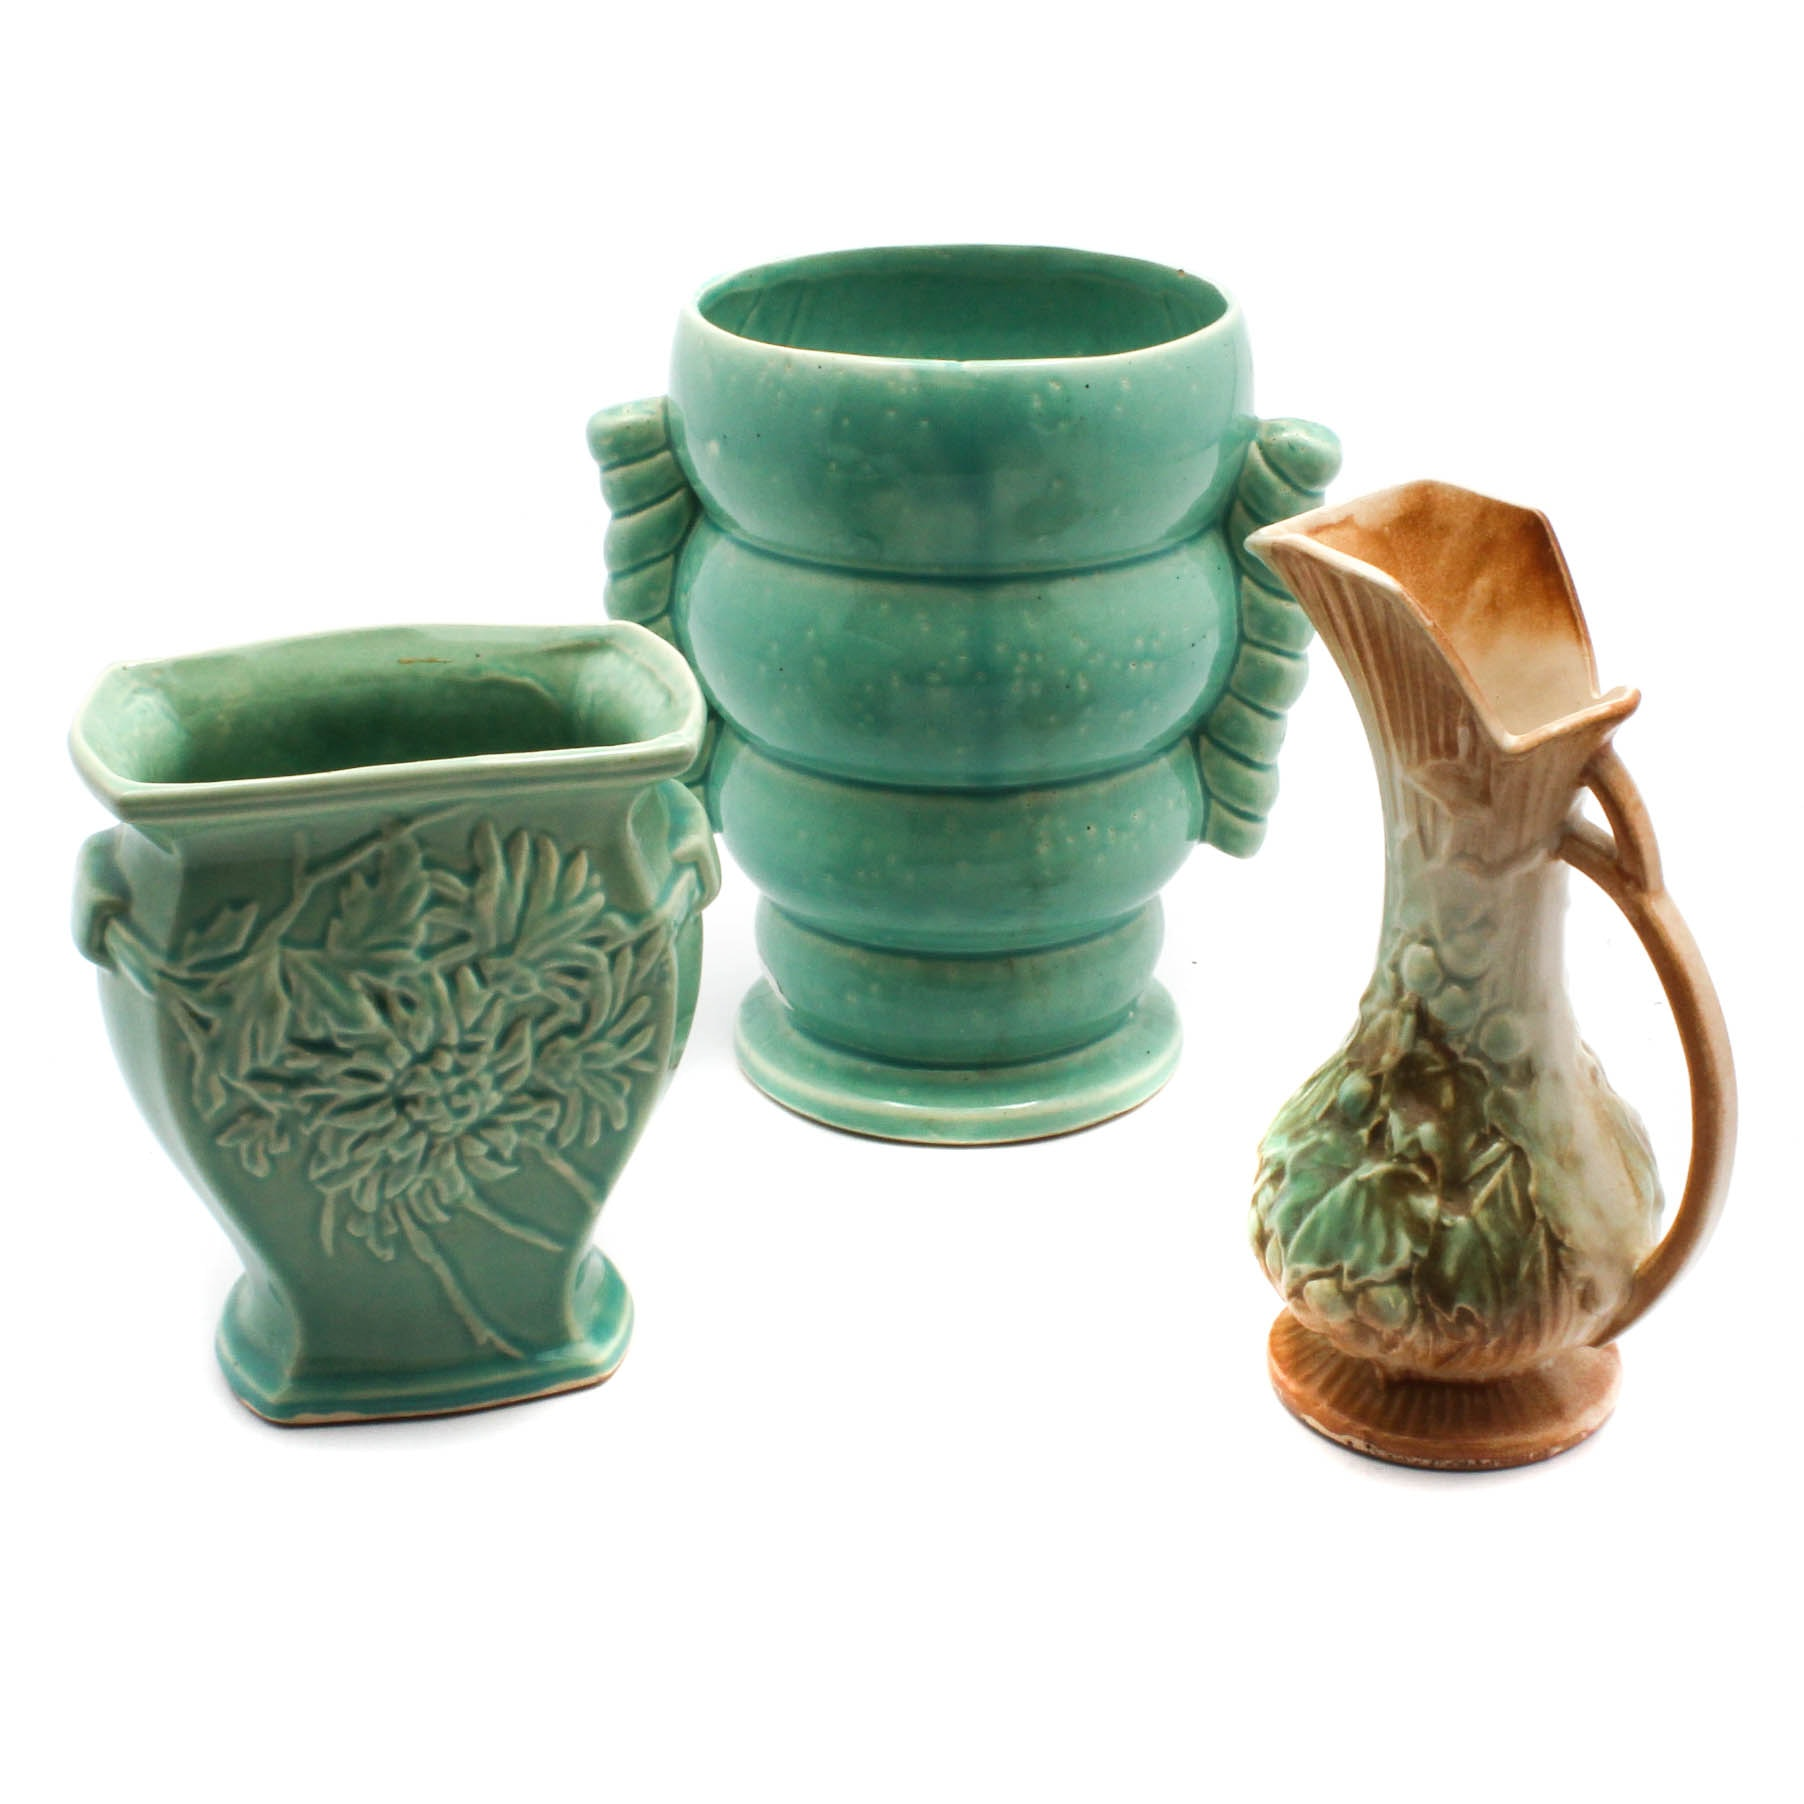 Vintage McCoy Pottery Ewer and Vases